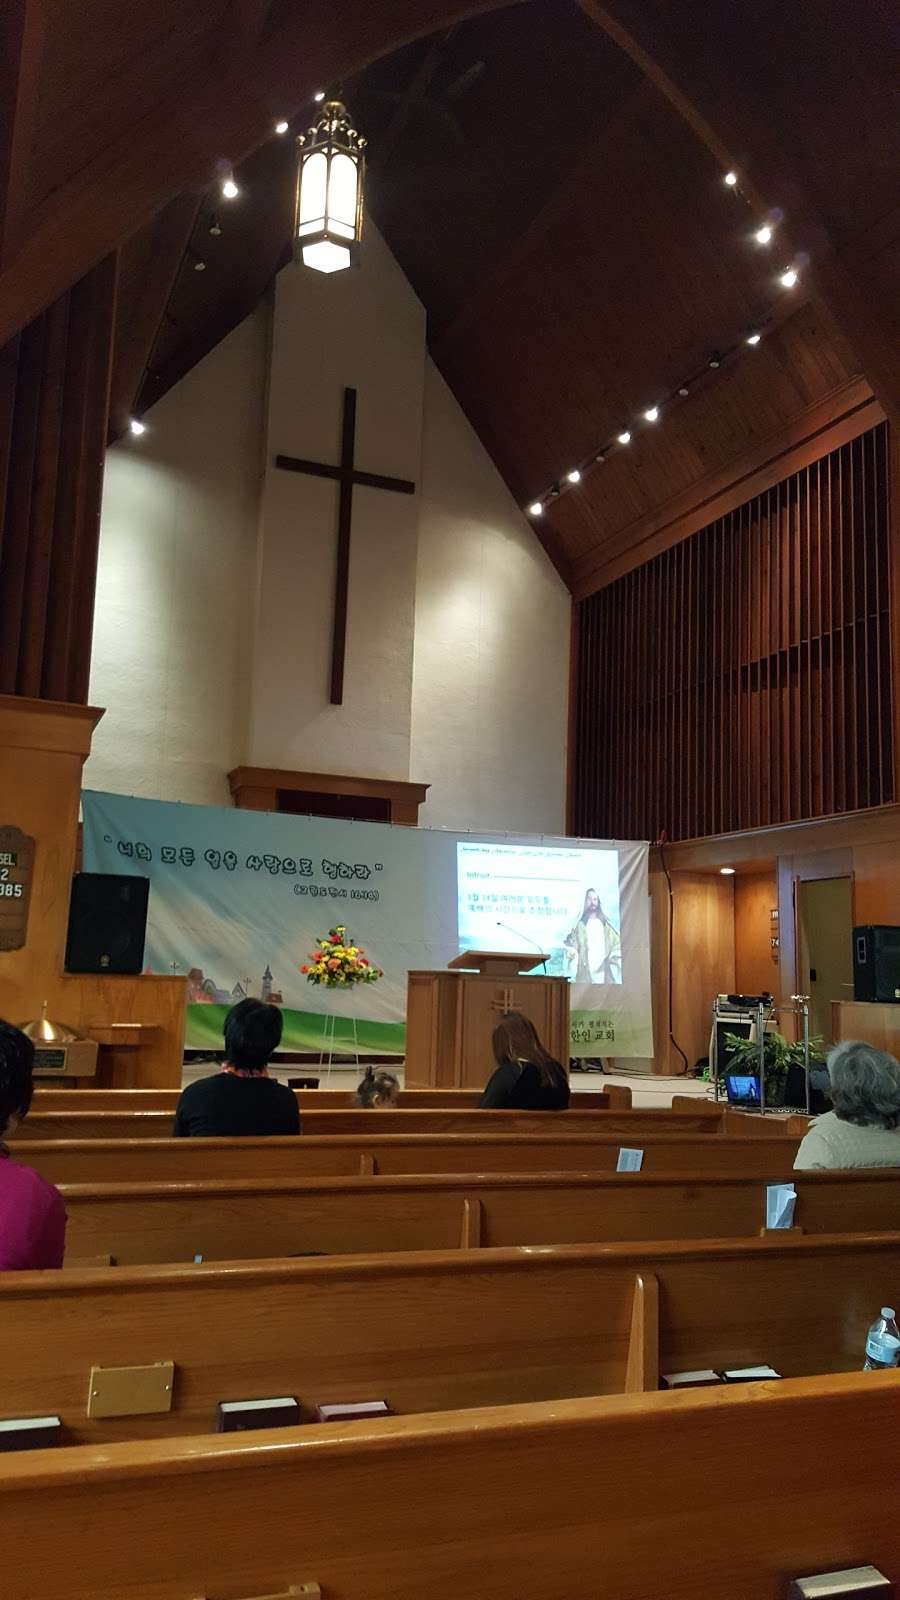 Fort Lee Korean SDA Church - church  | Photo 1 of 1 | Address: 340 Bogert Rd, River Edge, NJ 07661, USA | Phone: (201) 956-0949